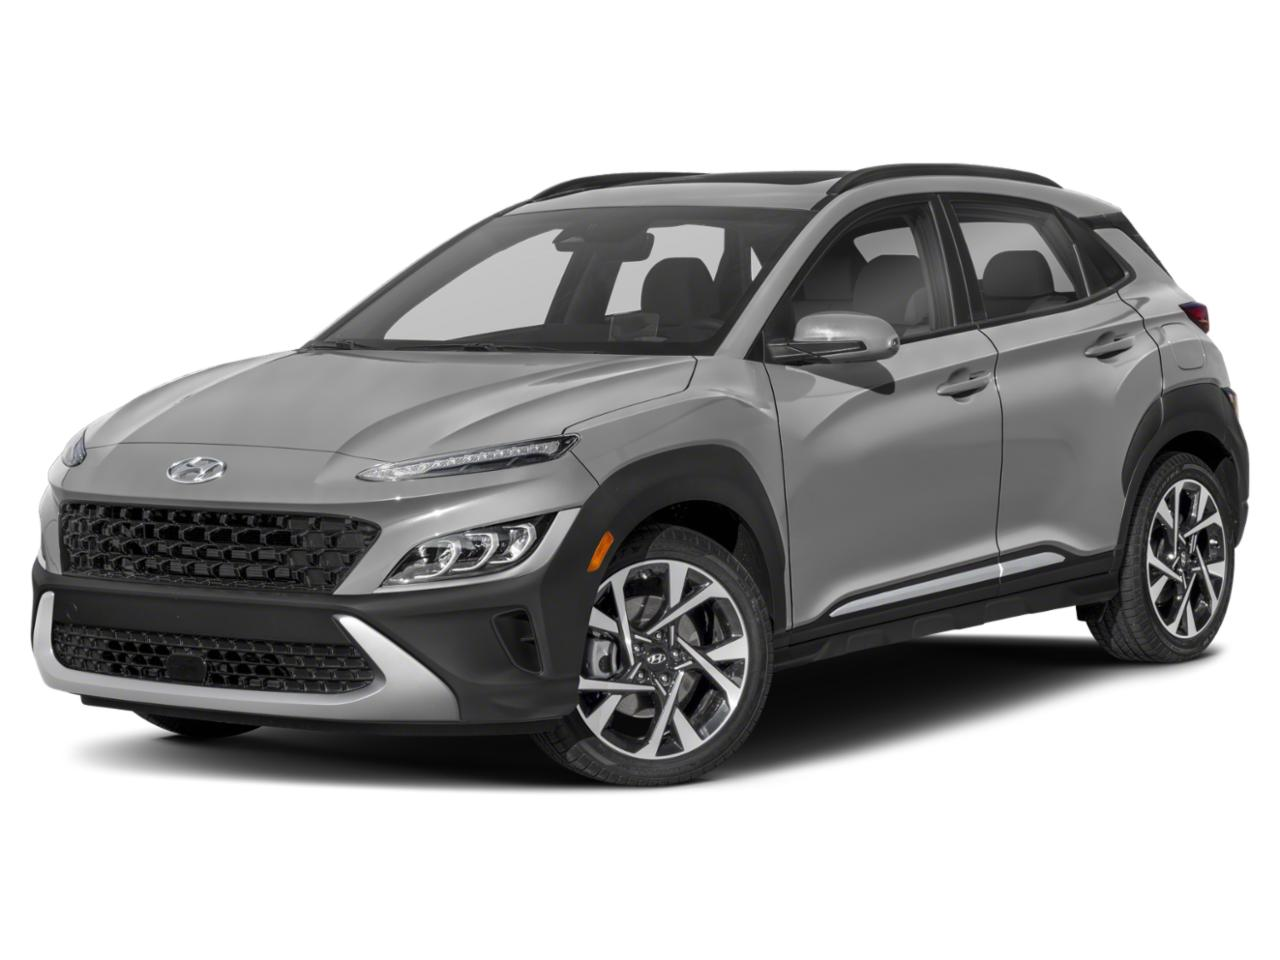 2022 Hyundai Kona Vehicle Photo in Odessa, TX 79762